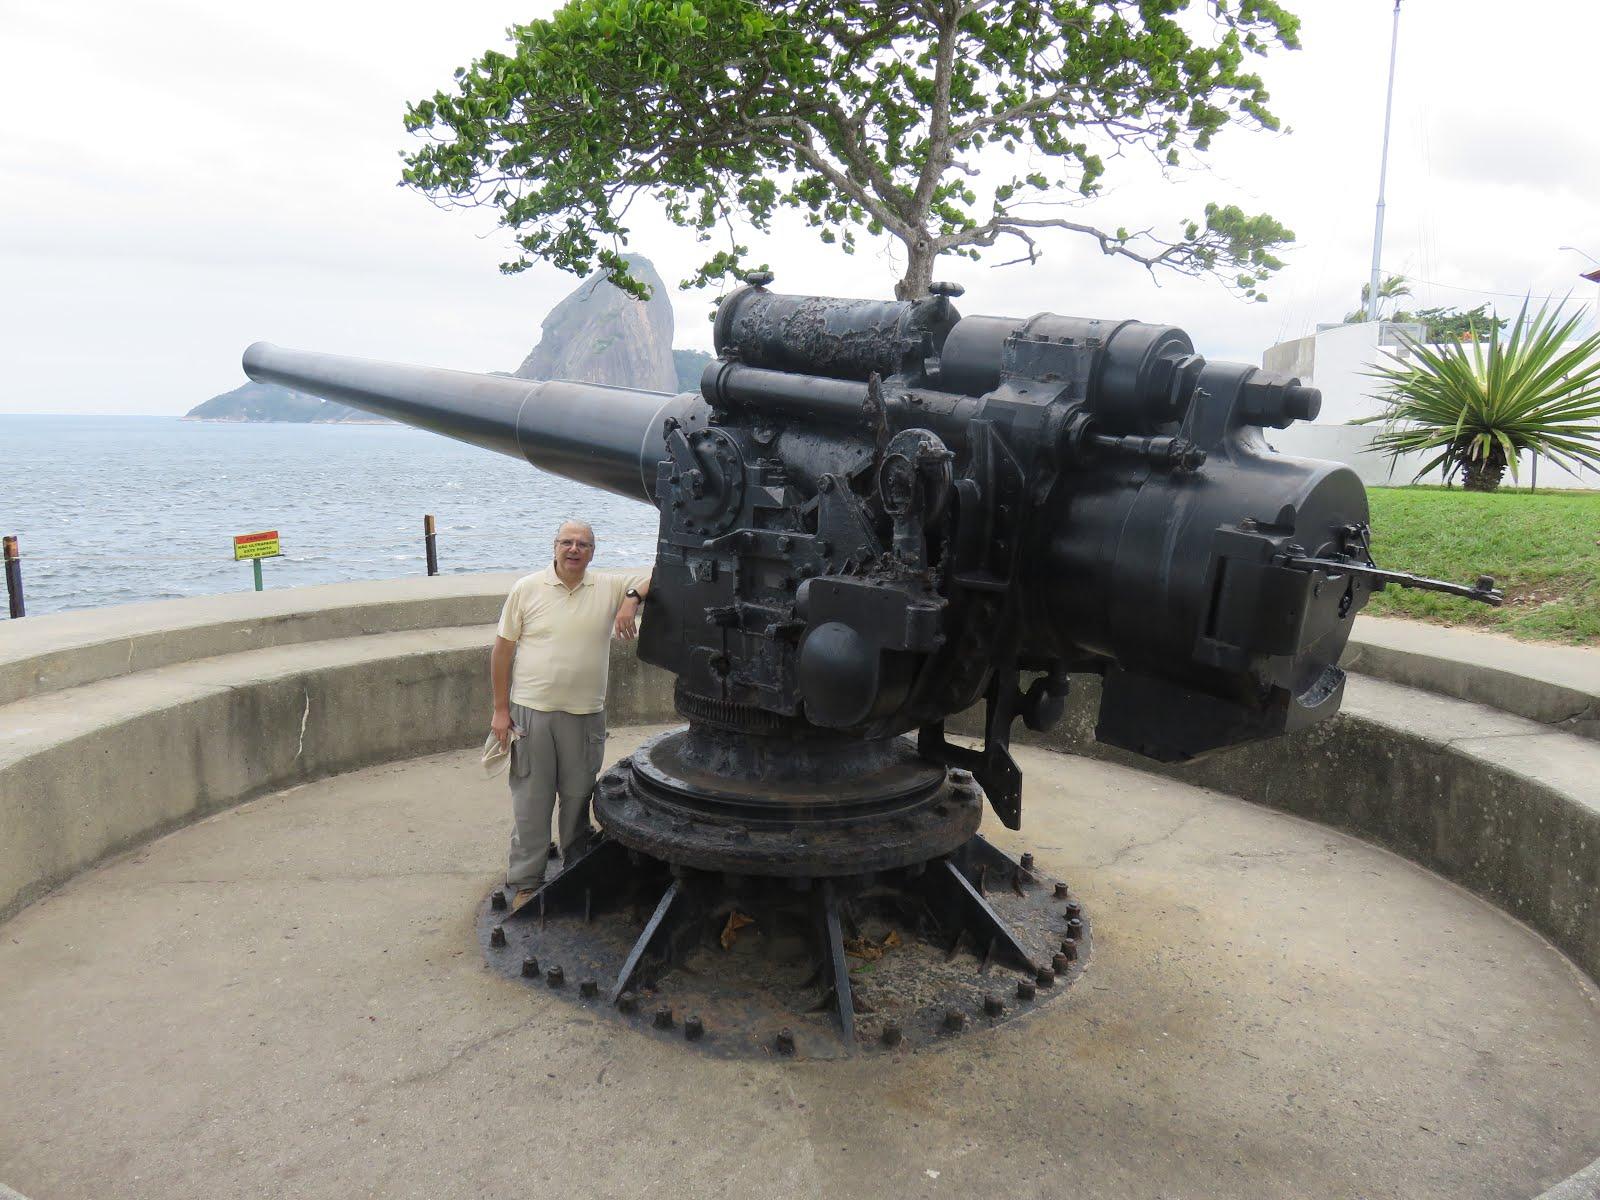 Artillería histórica (Bahia de Guanavara, Brasil)